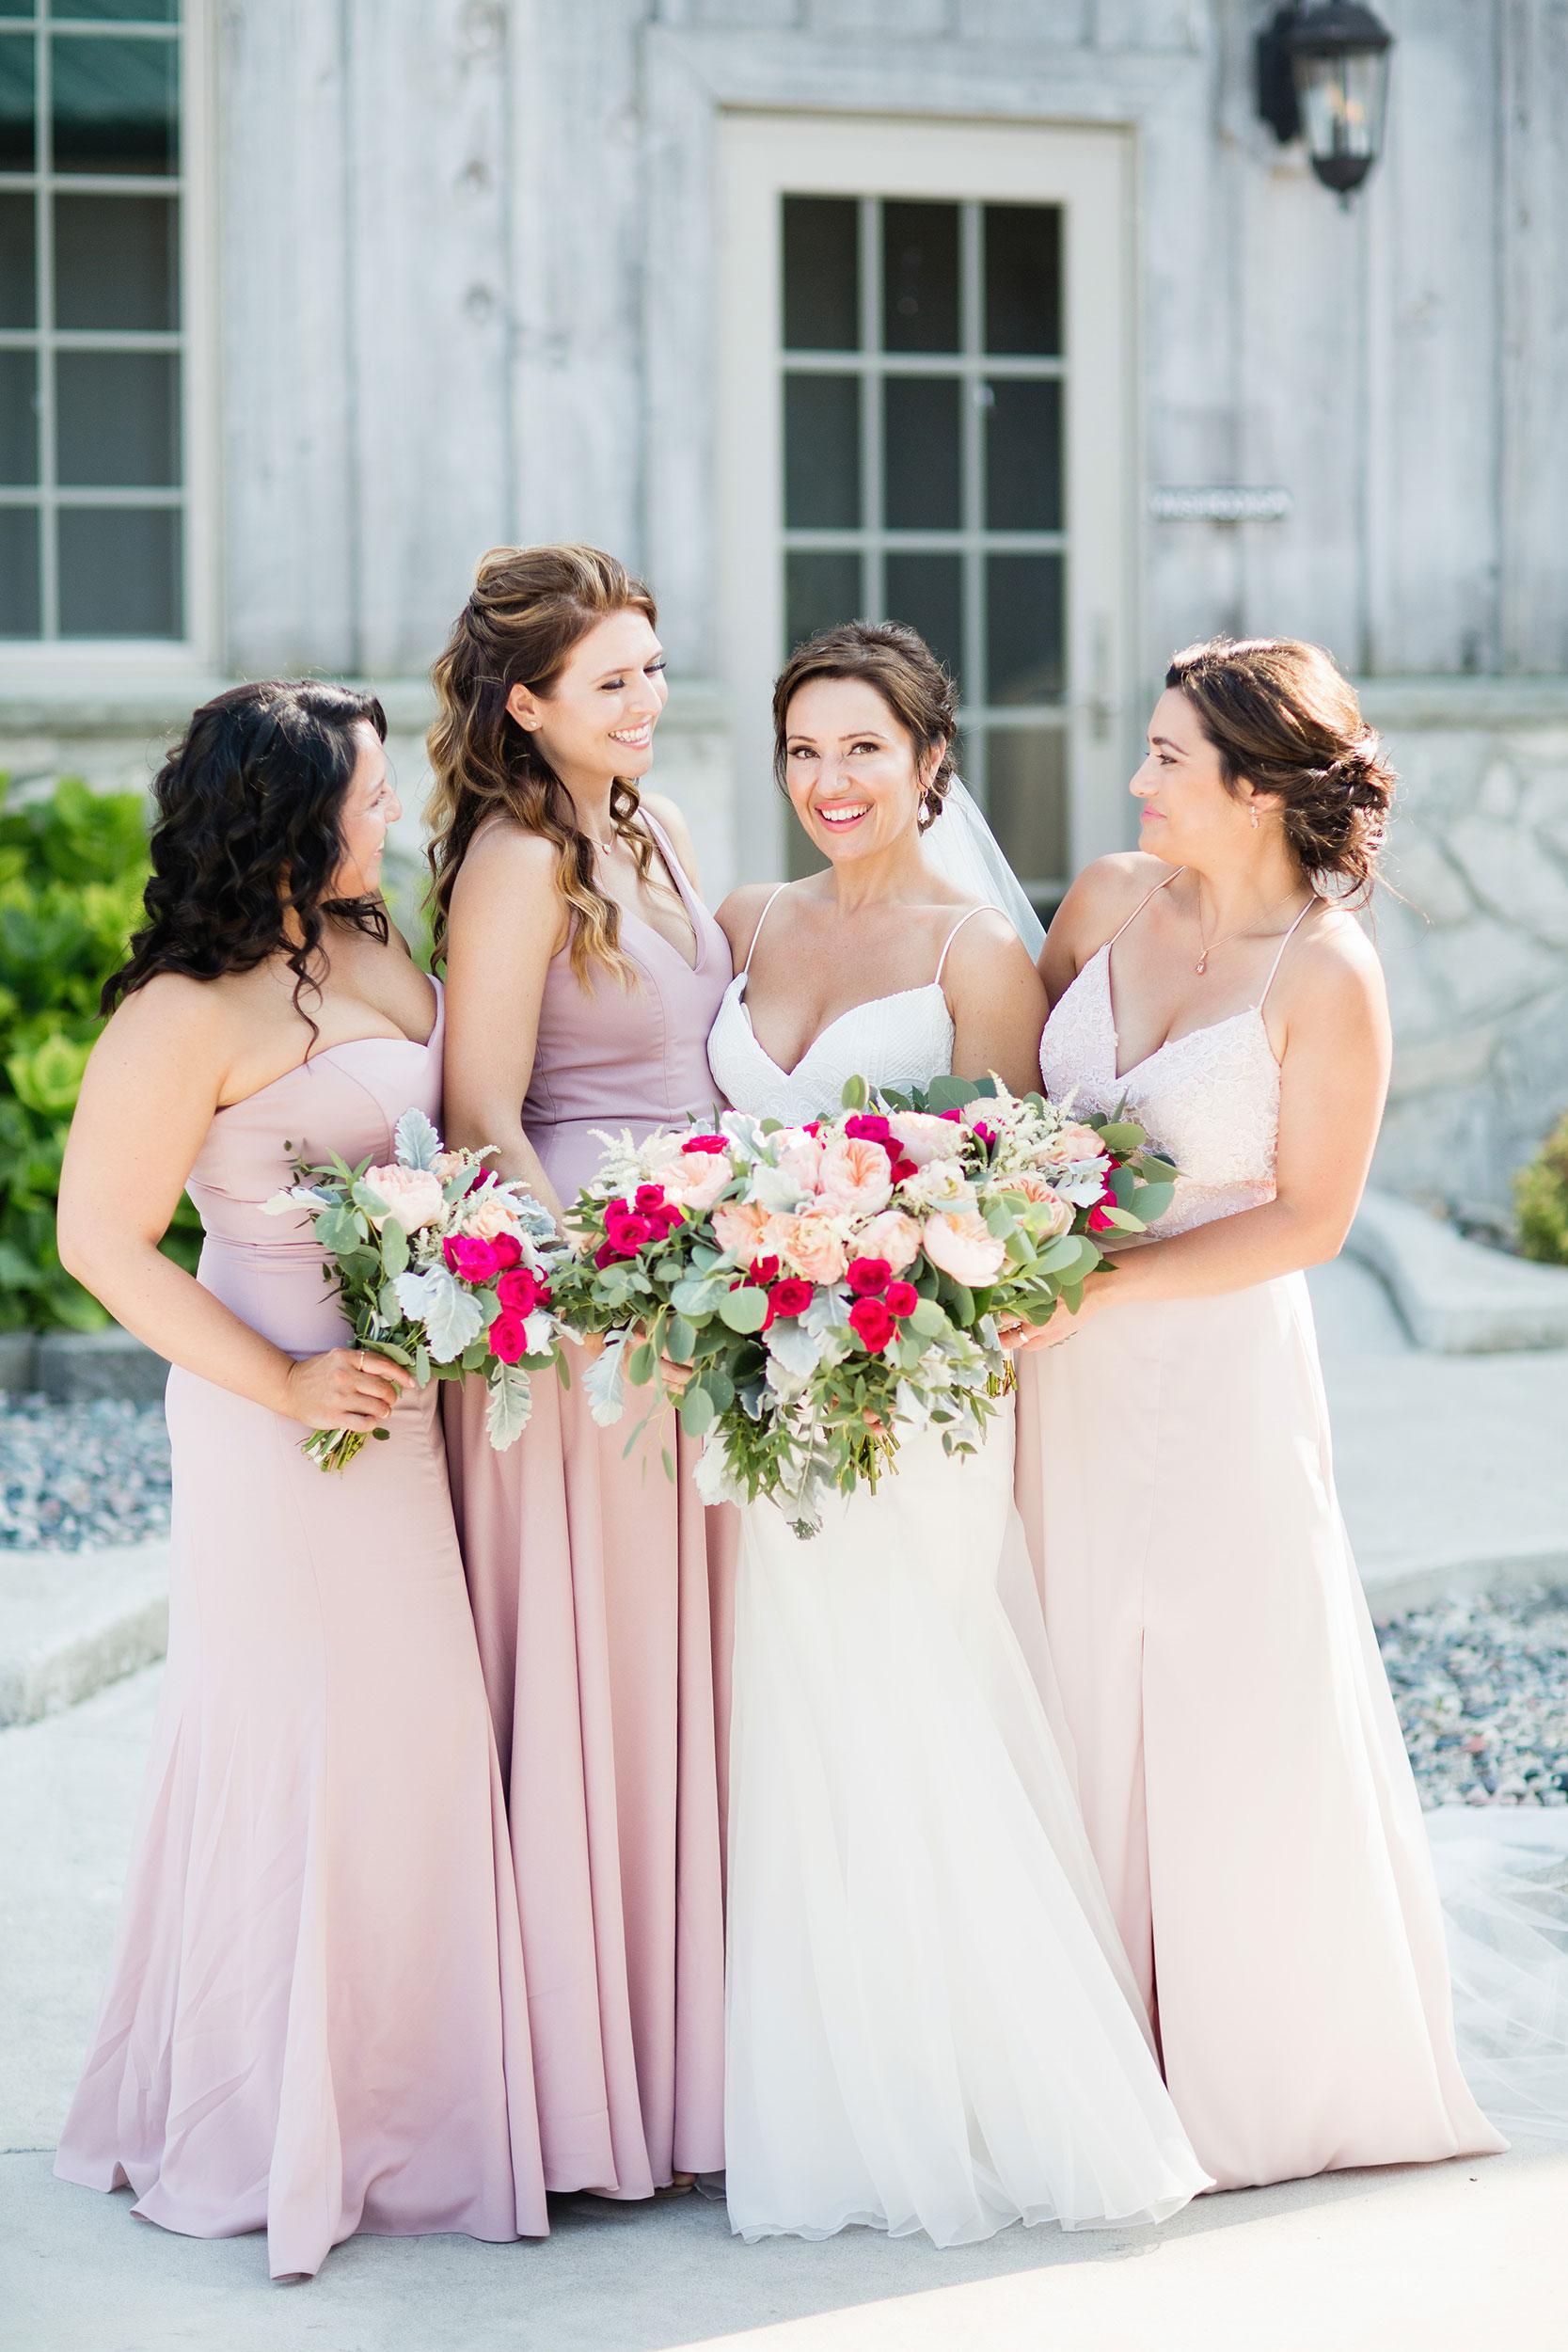 stylish-wedding-photography-windsor-toronto-ontario-wedding-photographer-sprucewood-winery-eryn-shea-photography-31.JPG